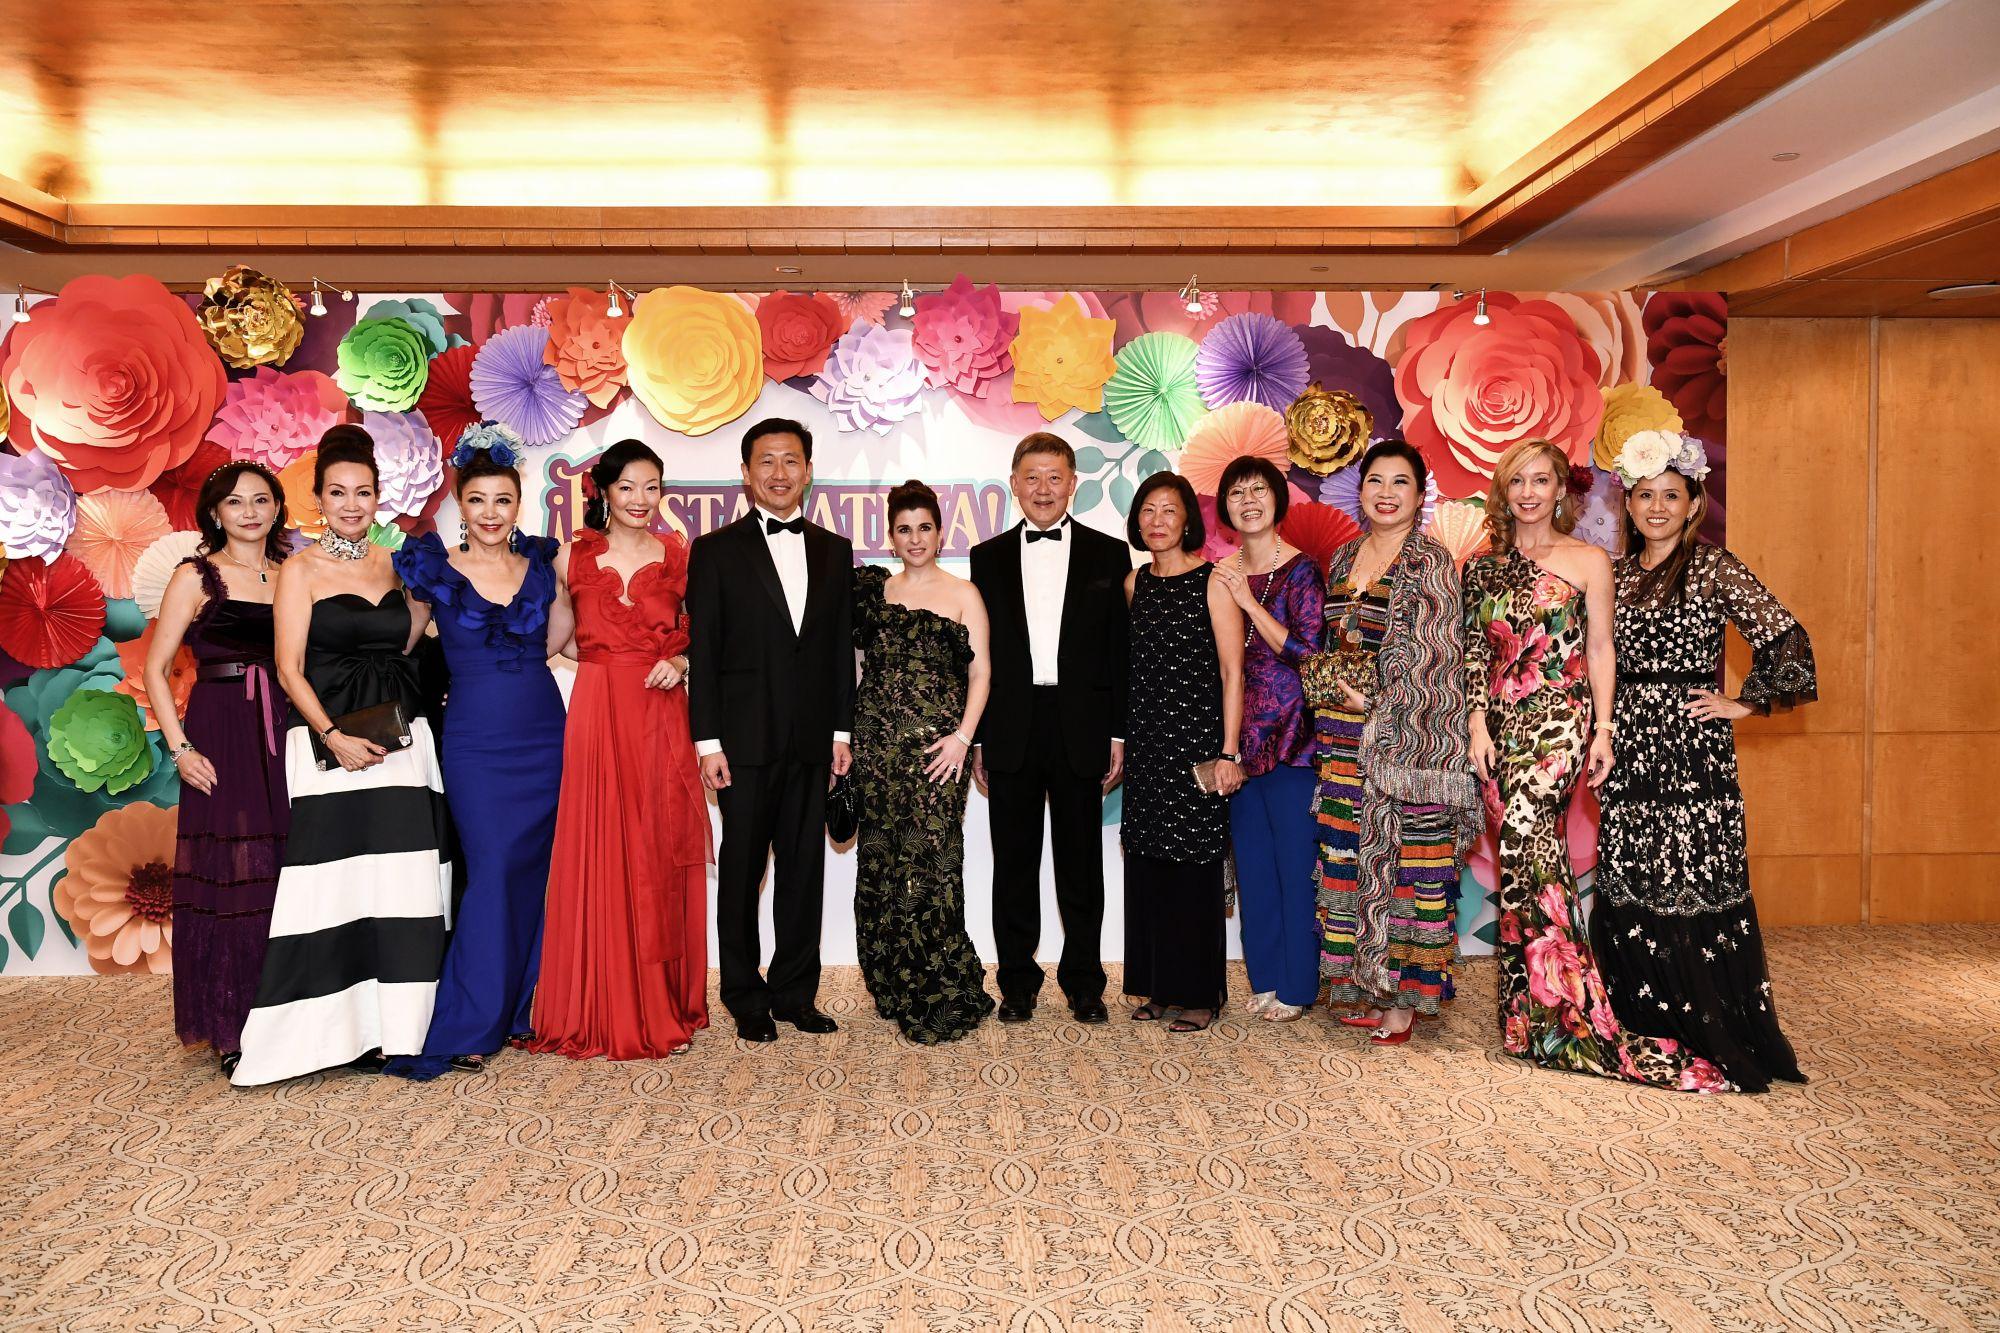 Julie Lo, Celeste Basapa, Grace Yeh, Maisy Koh, Ong Ye Kung, Odile Benjamin, Goh Yew Lin, Kwan Lui, Annie Koh, Kris Tan, Paige Parker, Judy Hunt